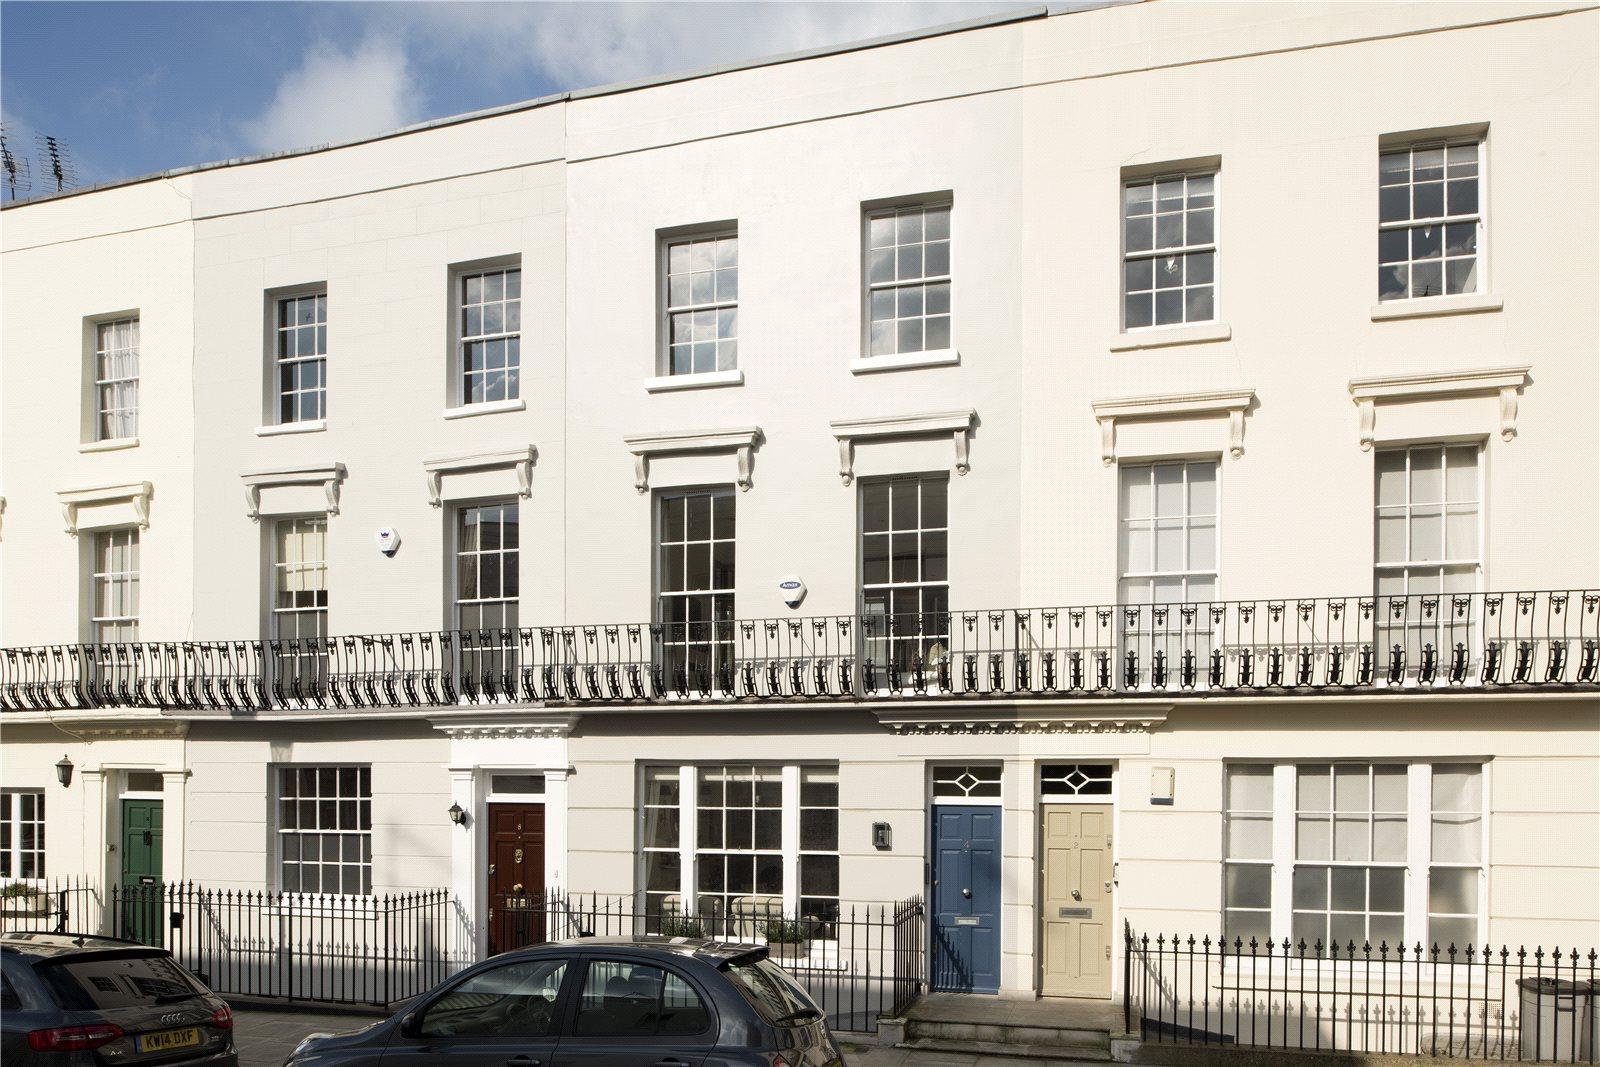 Частный дом для того Продажа на Queensdale Road, Holland Park, London, W11 Holland Park, London, Англия